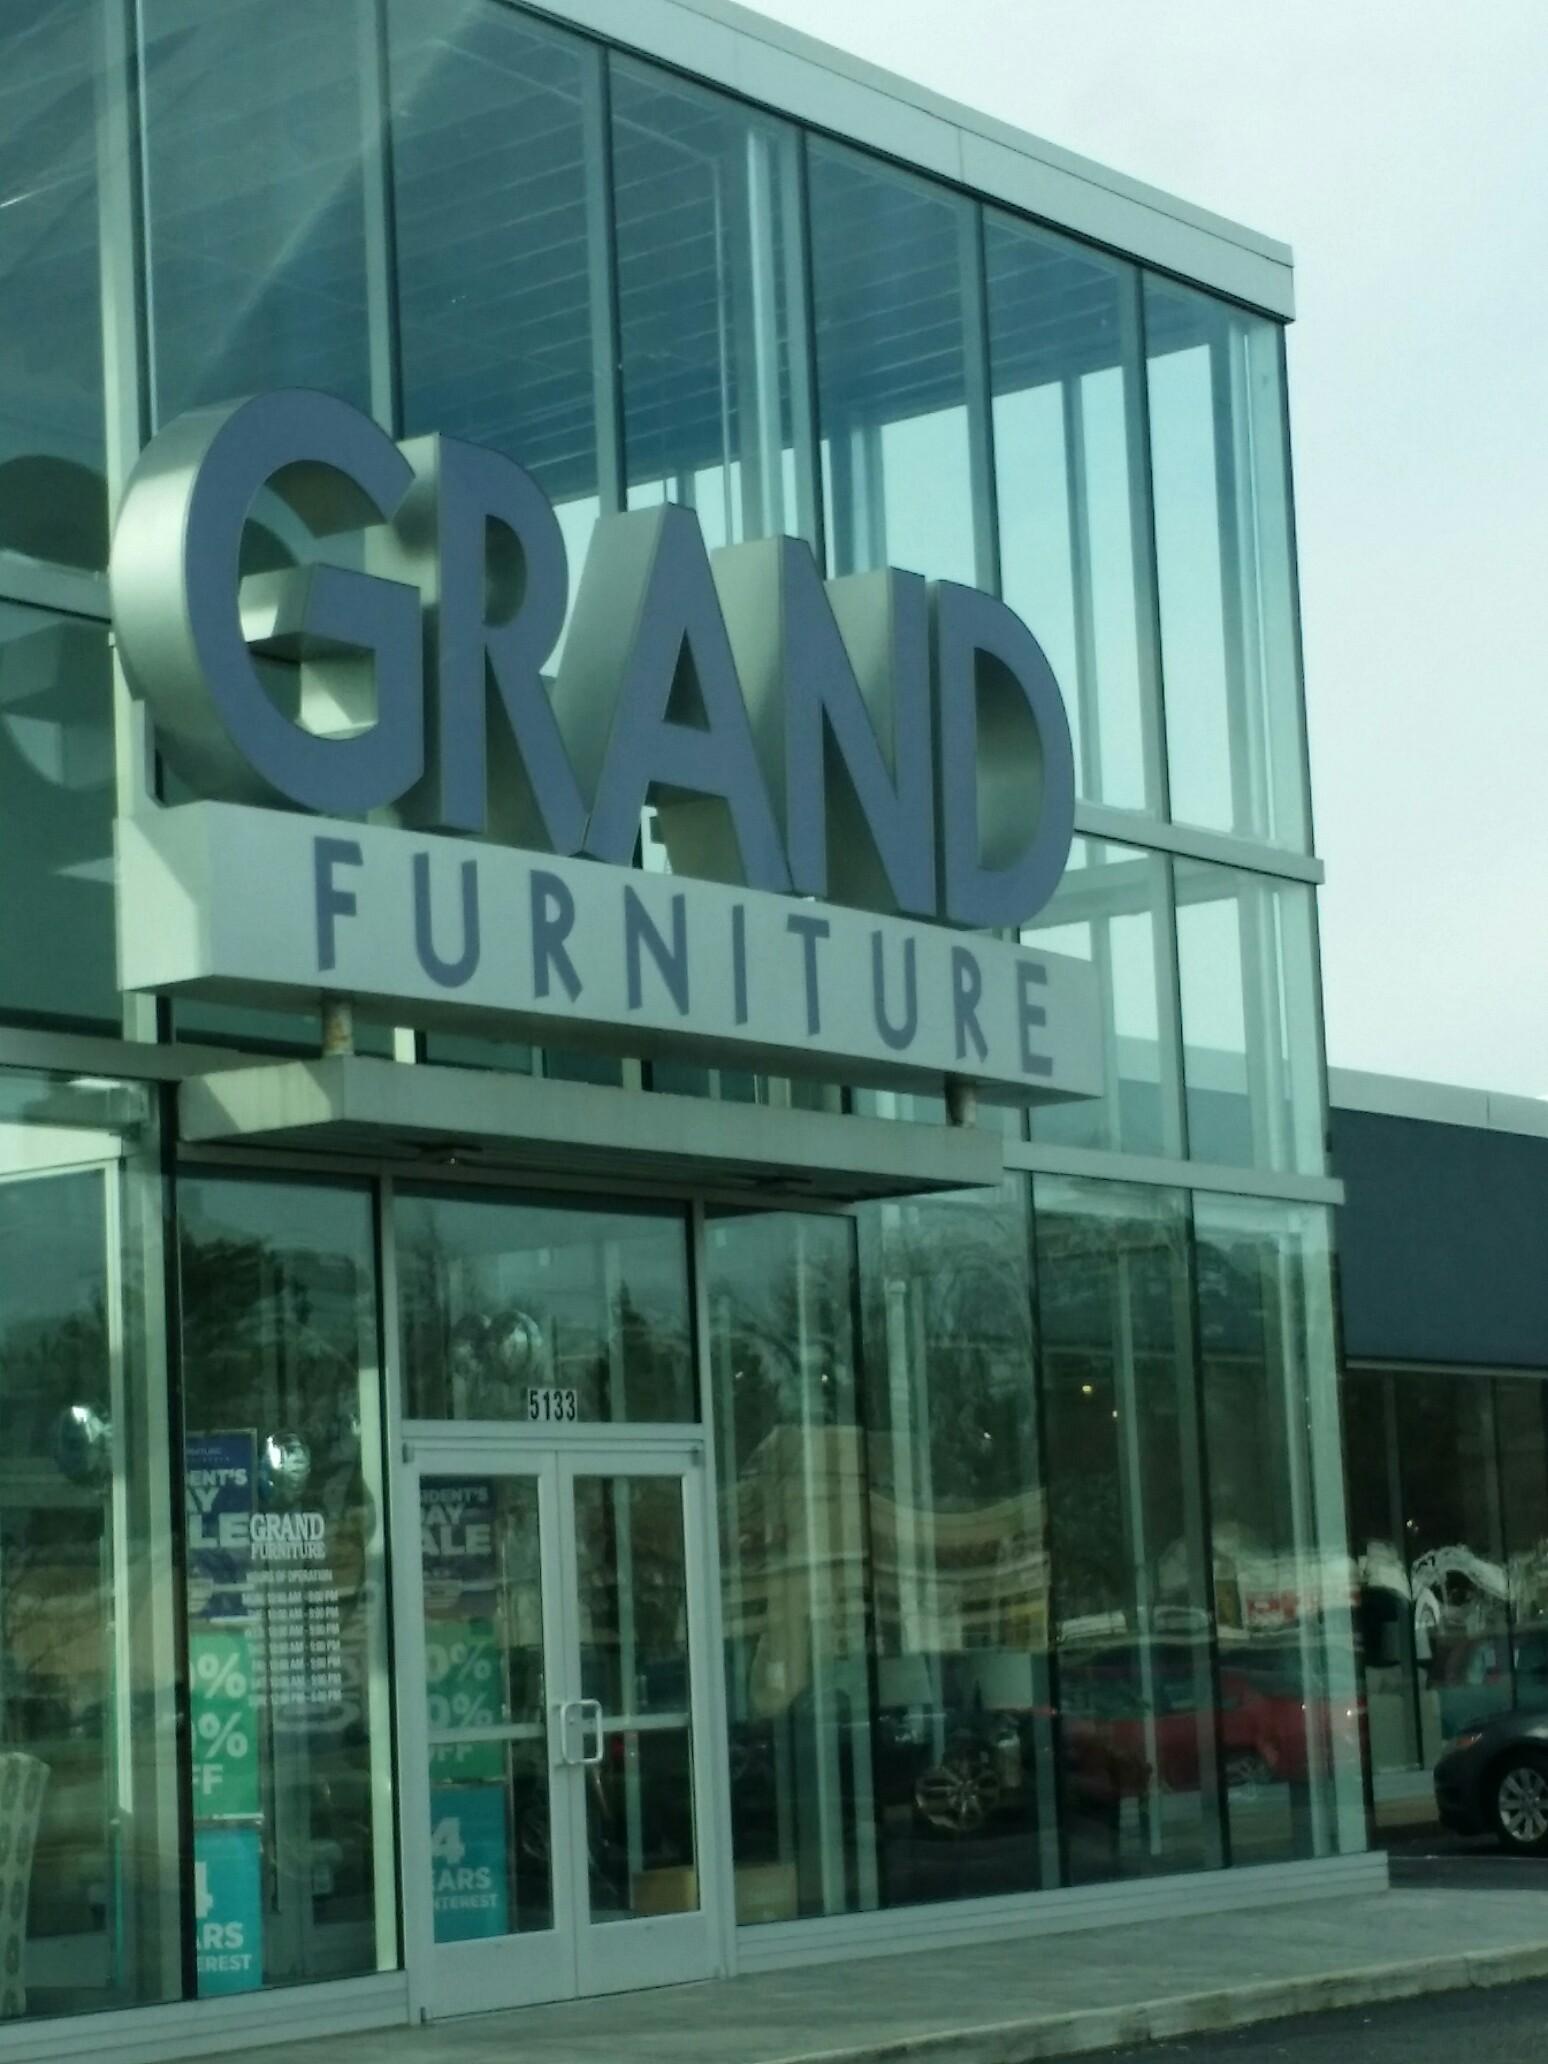 Grand Furniture 5133 Virginia Beach Blvd, Virginia Beach, VA 23462   YP.com